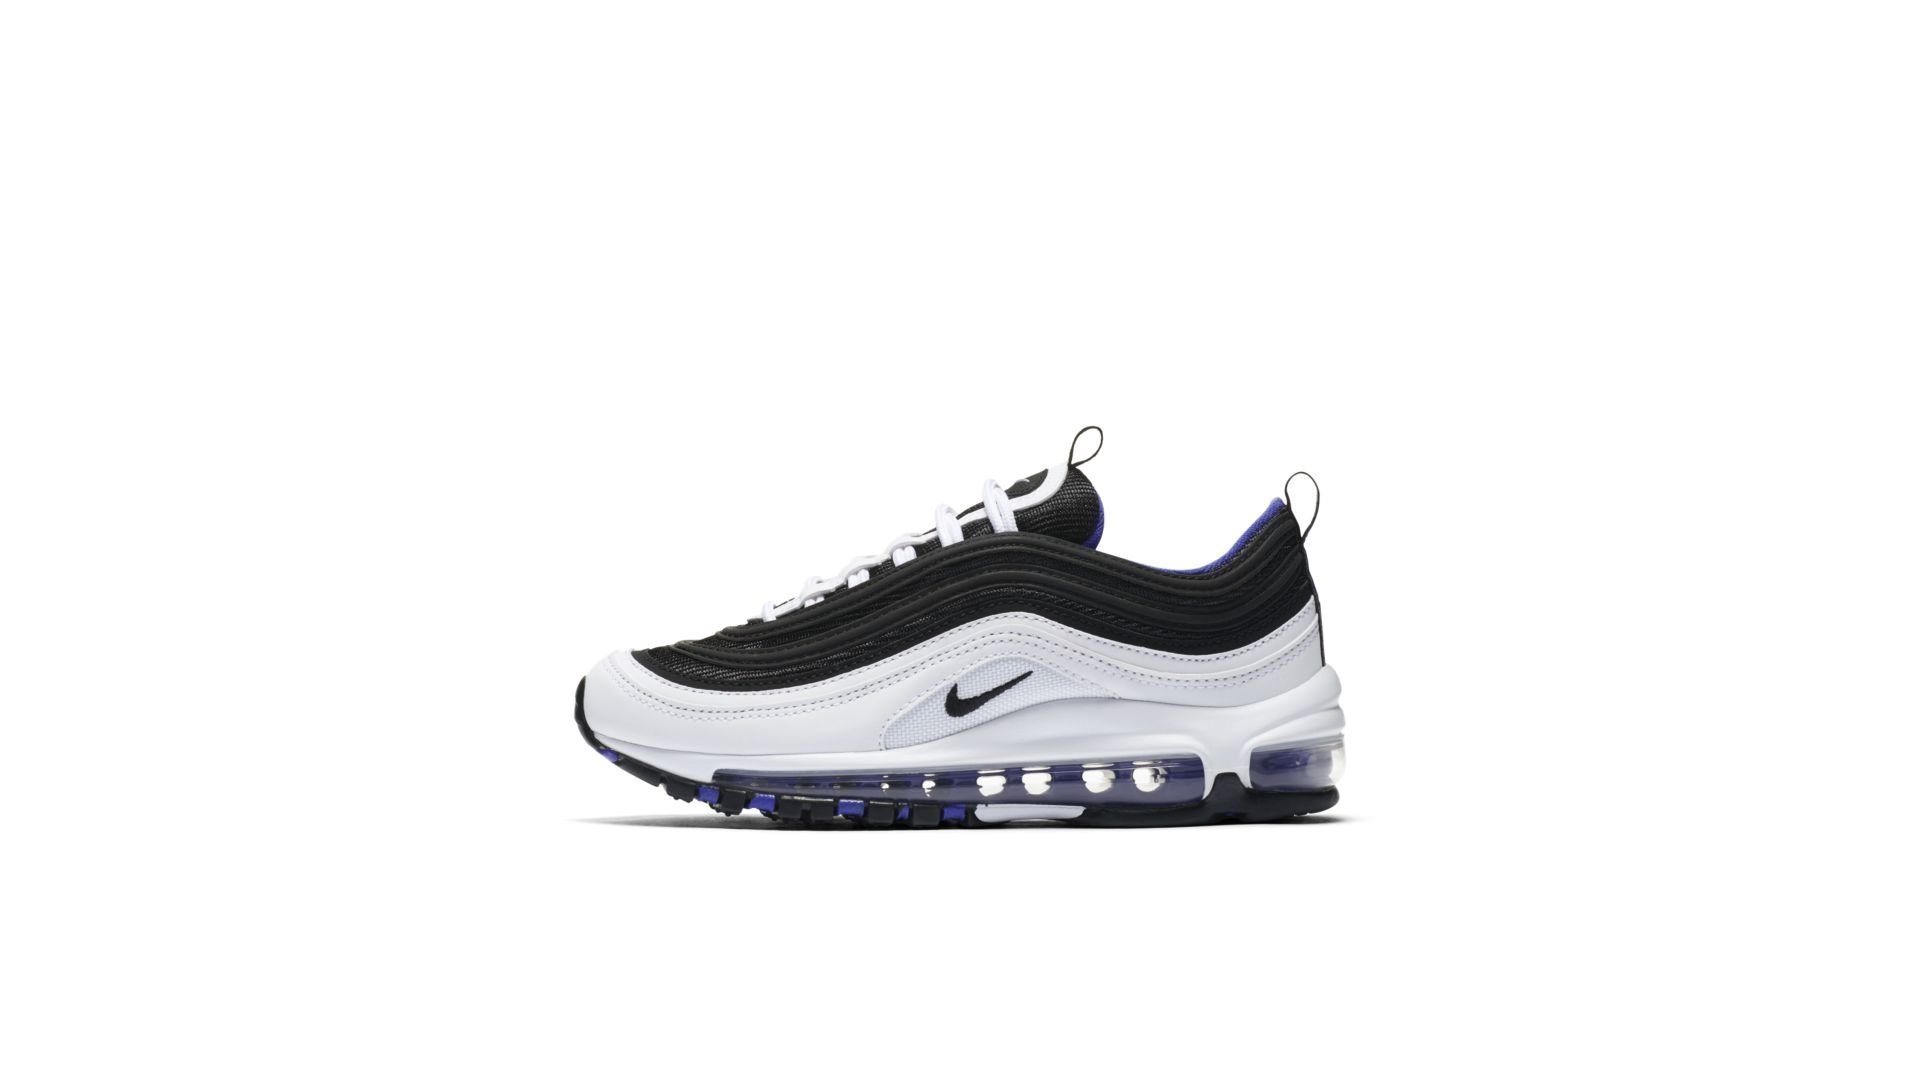 Nike Air Max 97 White Black Persian Violet (GS) (921522 102)